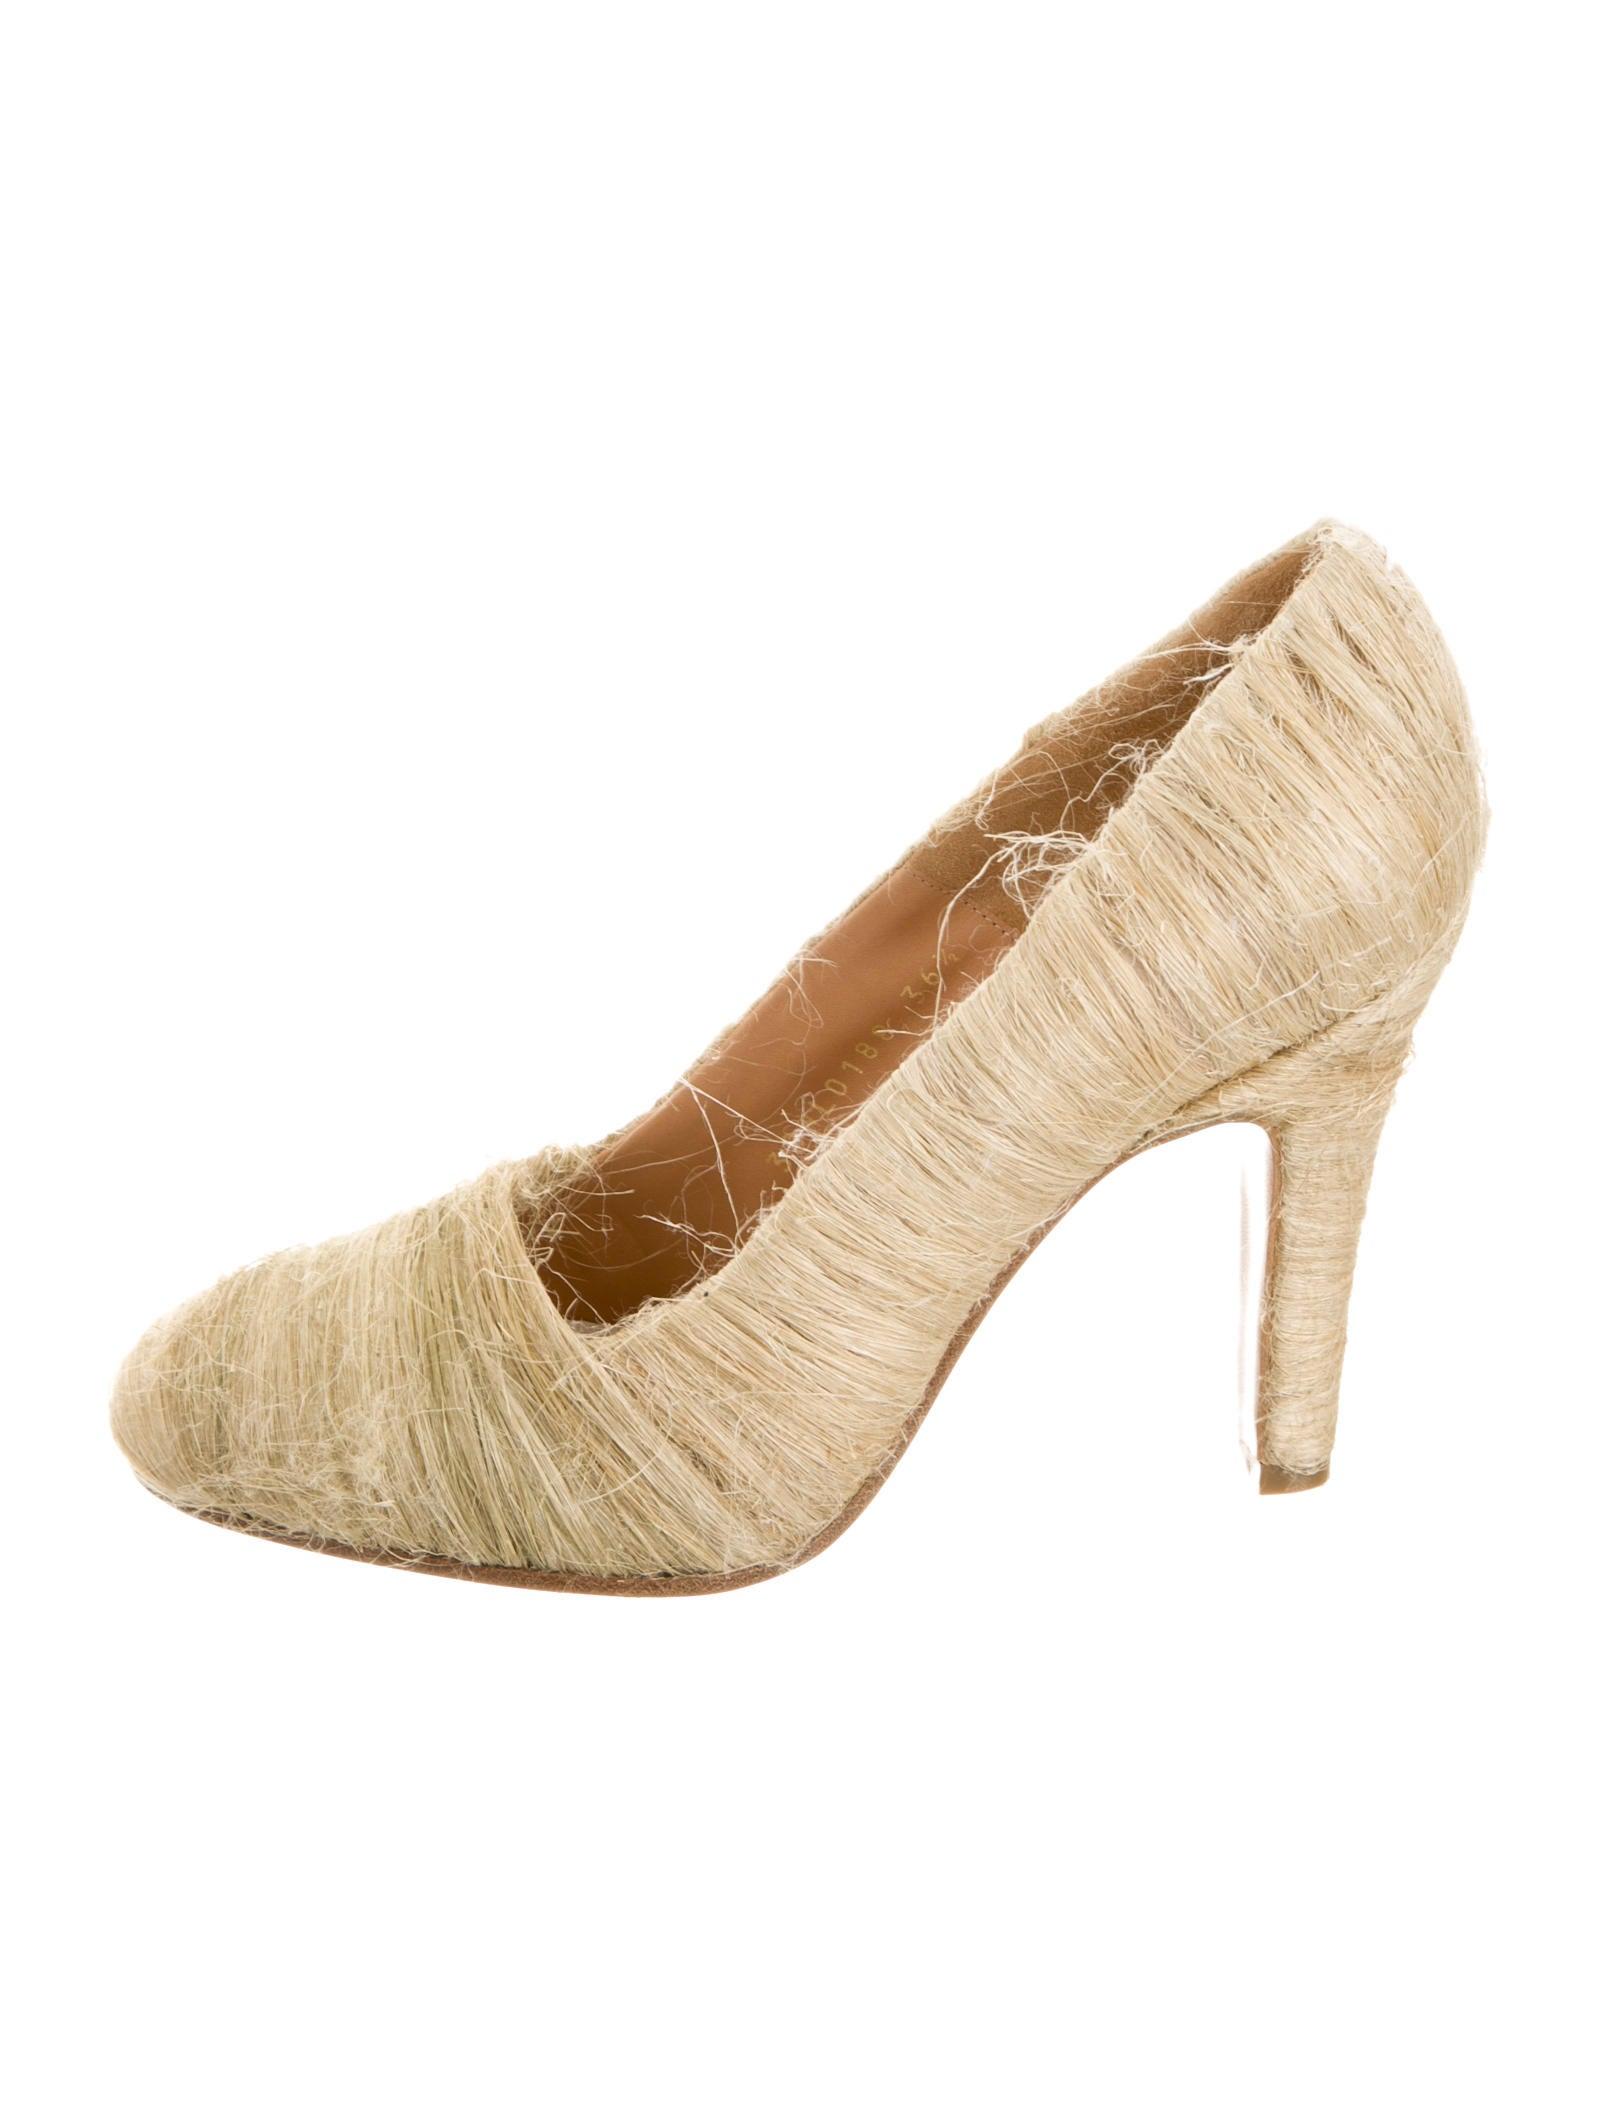 maison martin margiela pumps shoes mai23481 the realreal. Black Bedroom Furniture Sets. Home Design Ideas